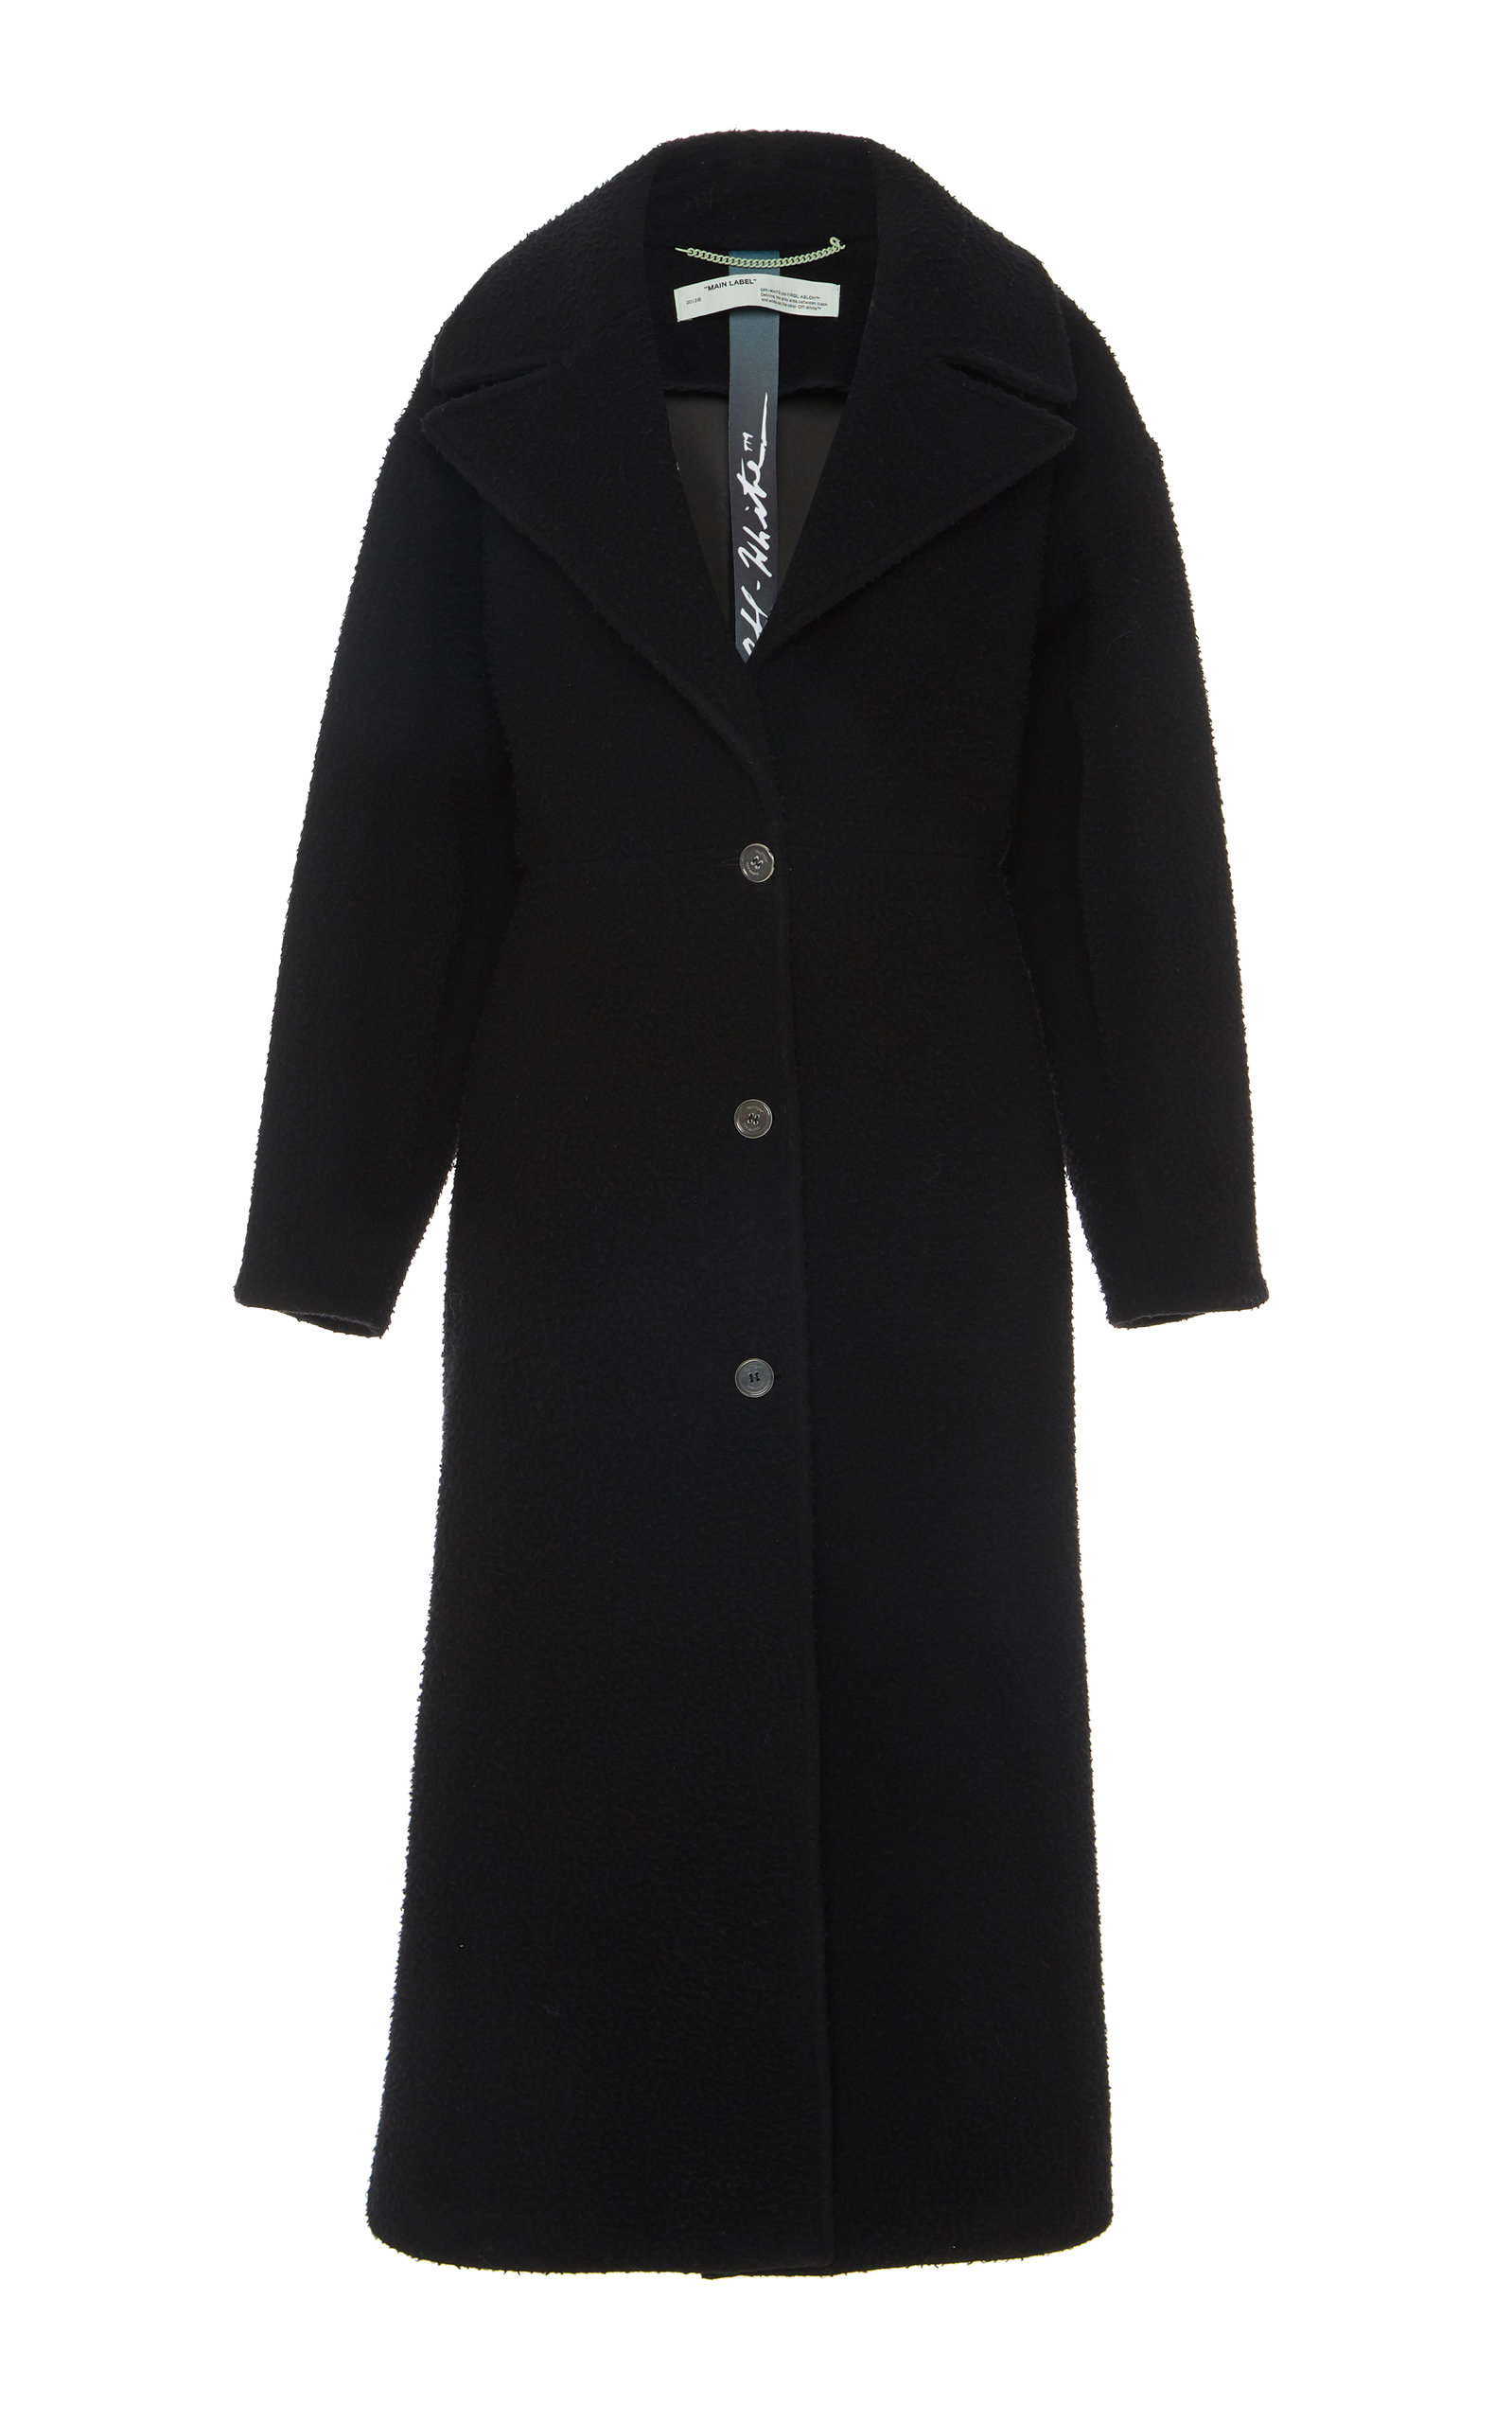 Off-White Coats WOOL OVERCOAT SIZE: 46